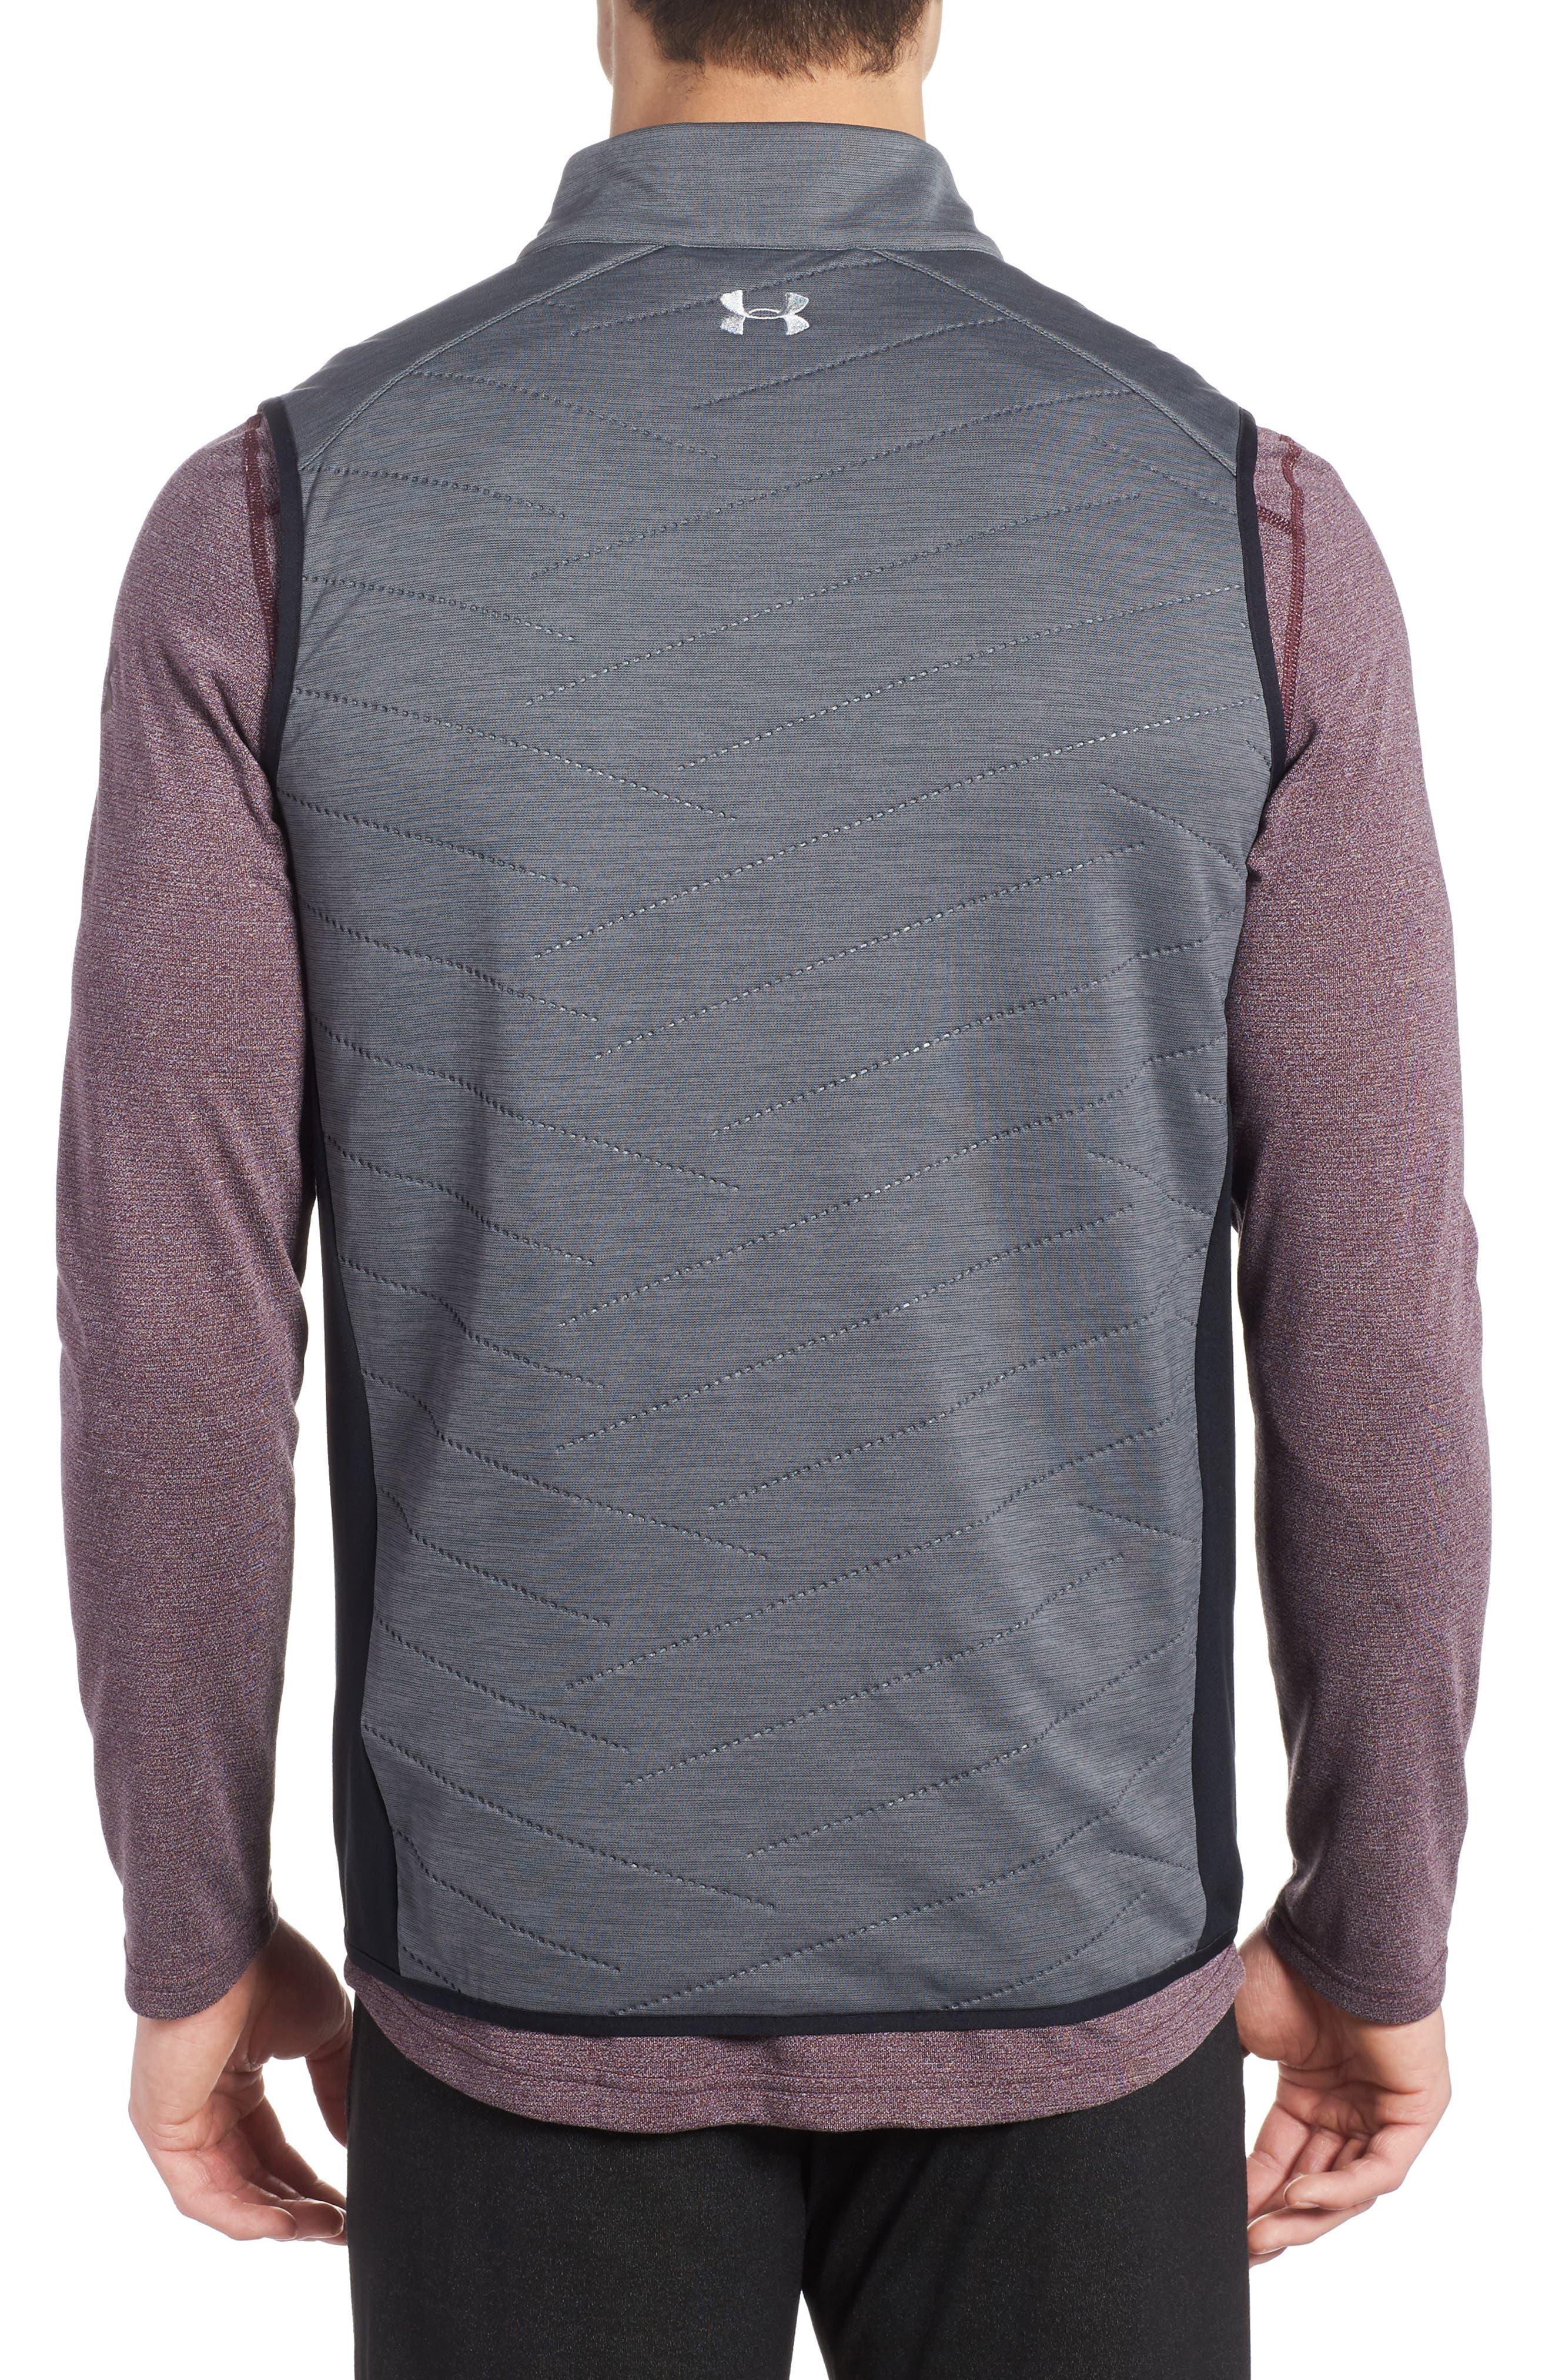 Reactor Hybrid Zip Vest,                             Alternate thumbnail 2, color,                             076